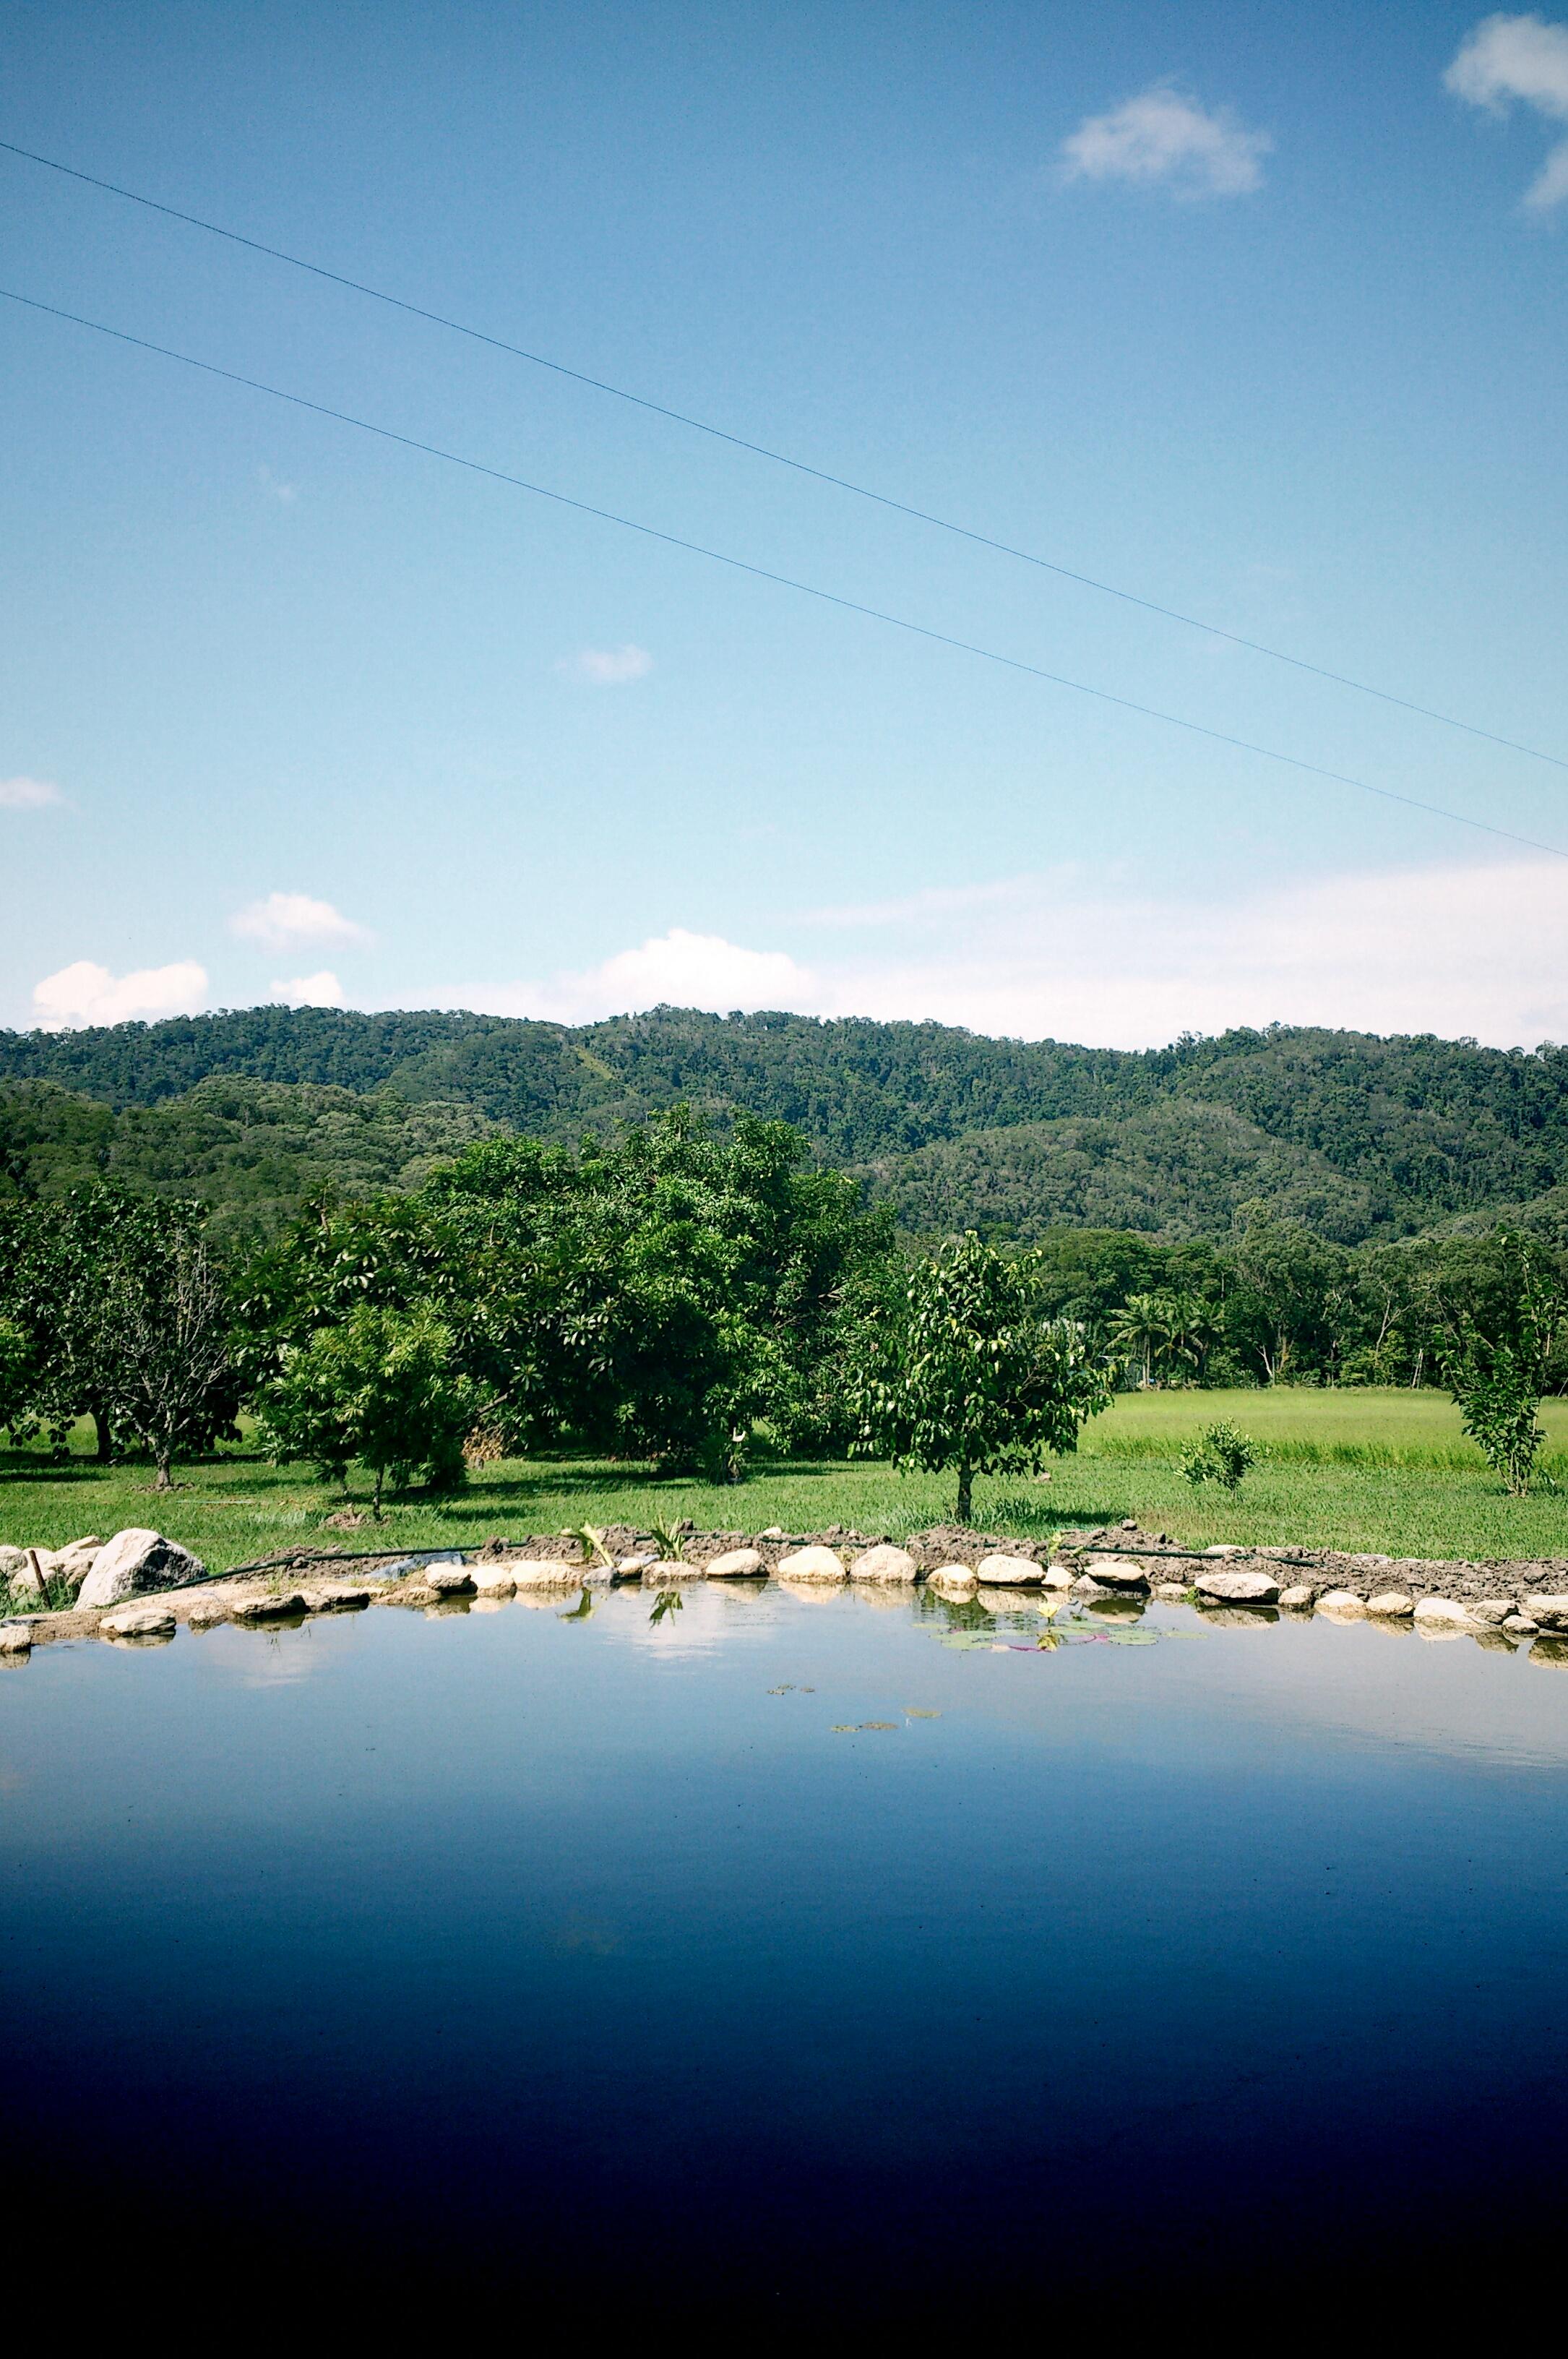 The first home in Mossman, Cairns. 第一個家@Mossman, Cairns。圖中是花園,池塘是利用利用的水源和石頭搭建,家人自己駁水源。工程涉及十多個背包客不同時間的參與,我是最後一名。